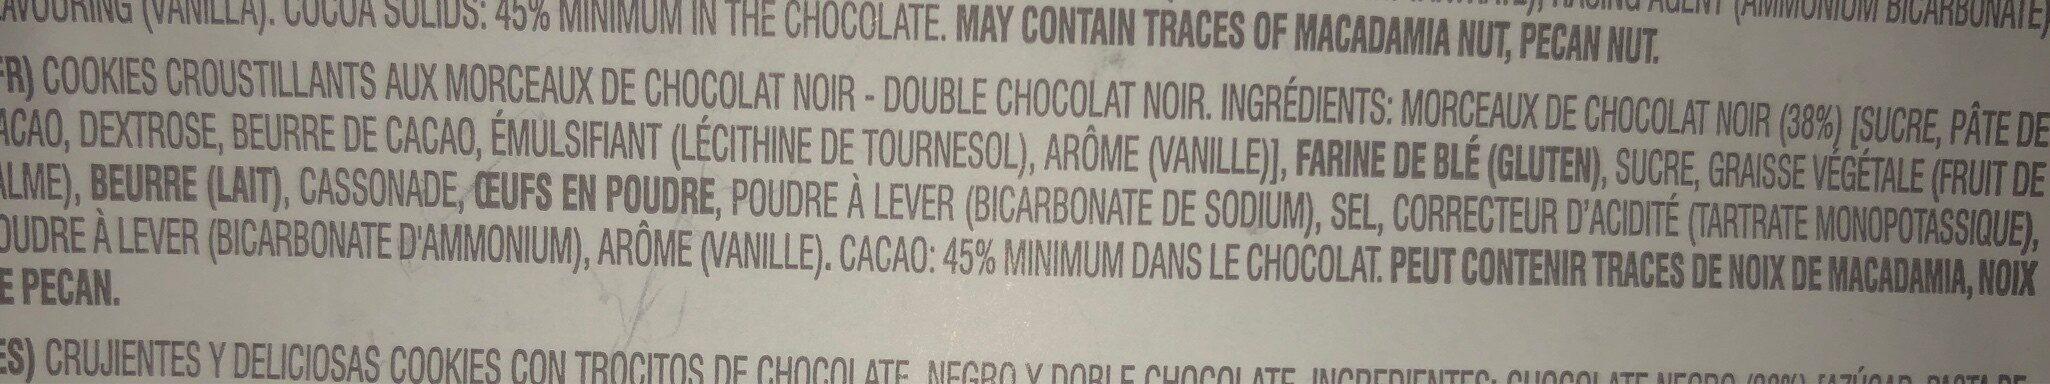 Chocolate Chunk Dark Double Chocolate Crispy Cookies - Ingrediënten - fr